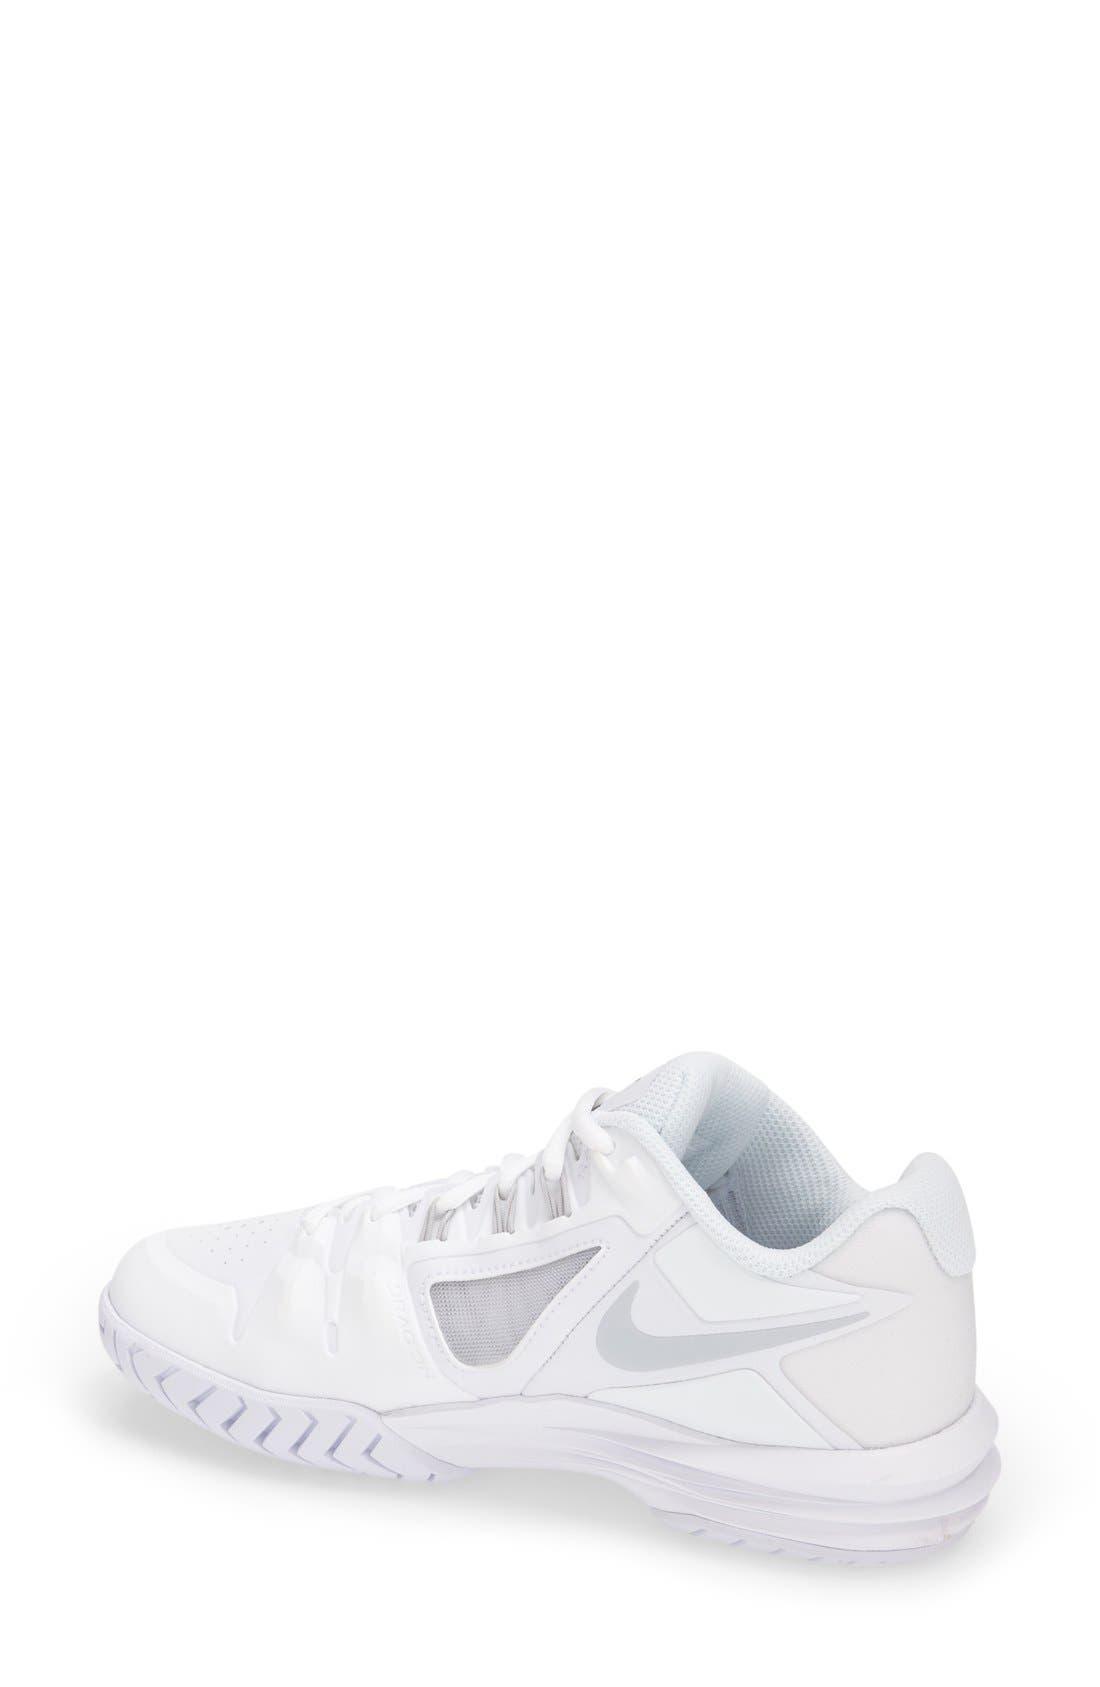 finest selection 136cb 45385 ... best price nike lunar ballistec 1.5 tennis shoe women nordstrom f5b7b  120b3